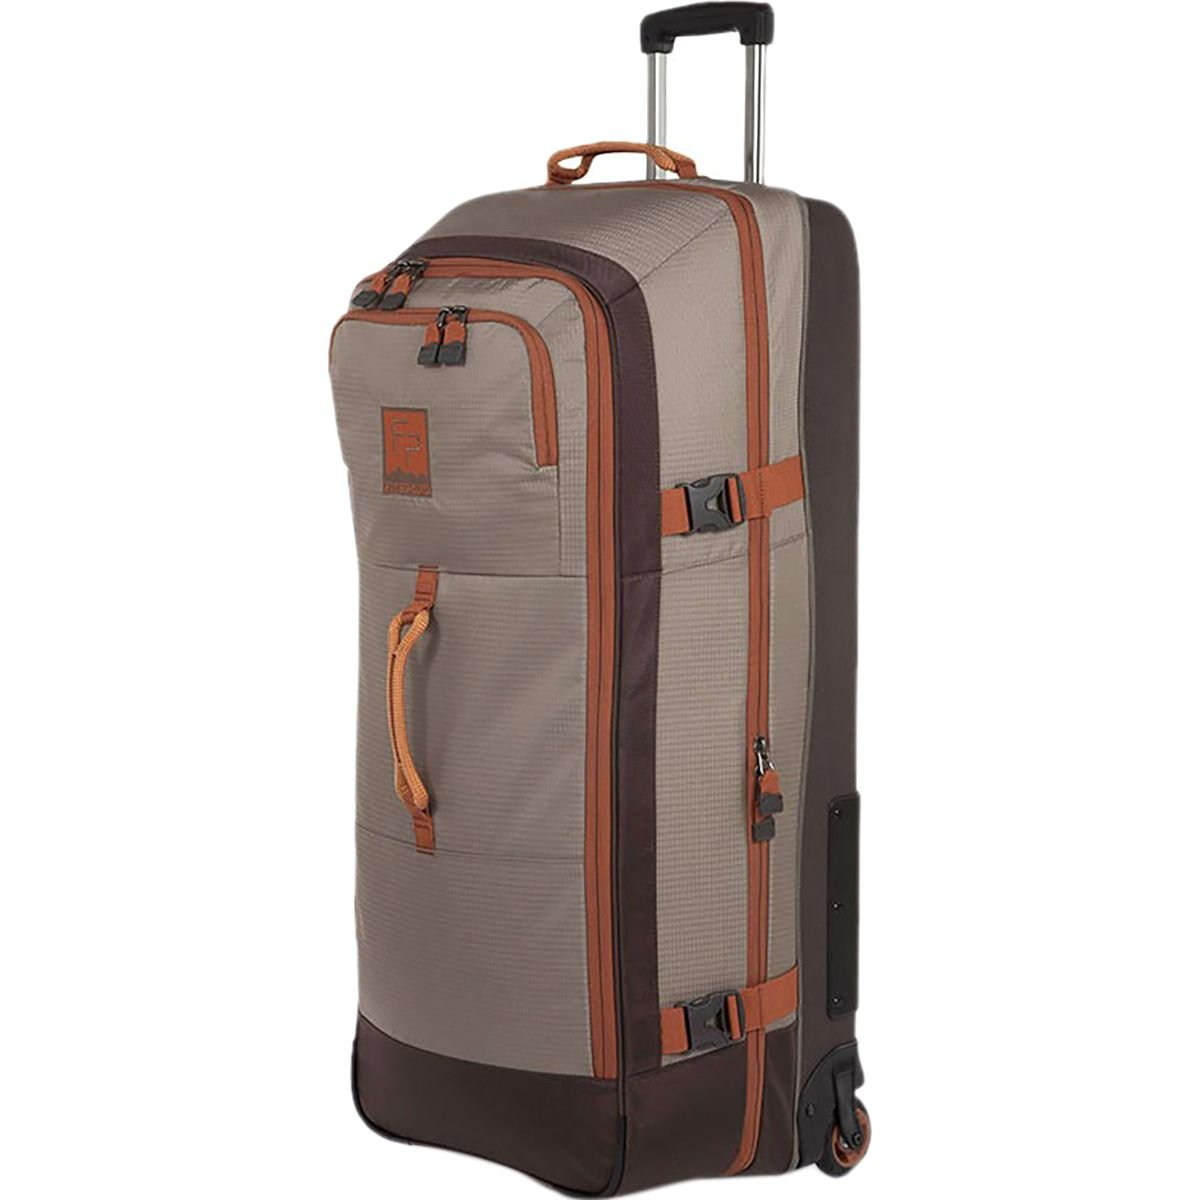 Fishpond Grand Teton Rolling Luggage 1色 One Size